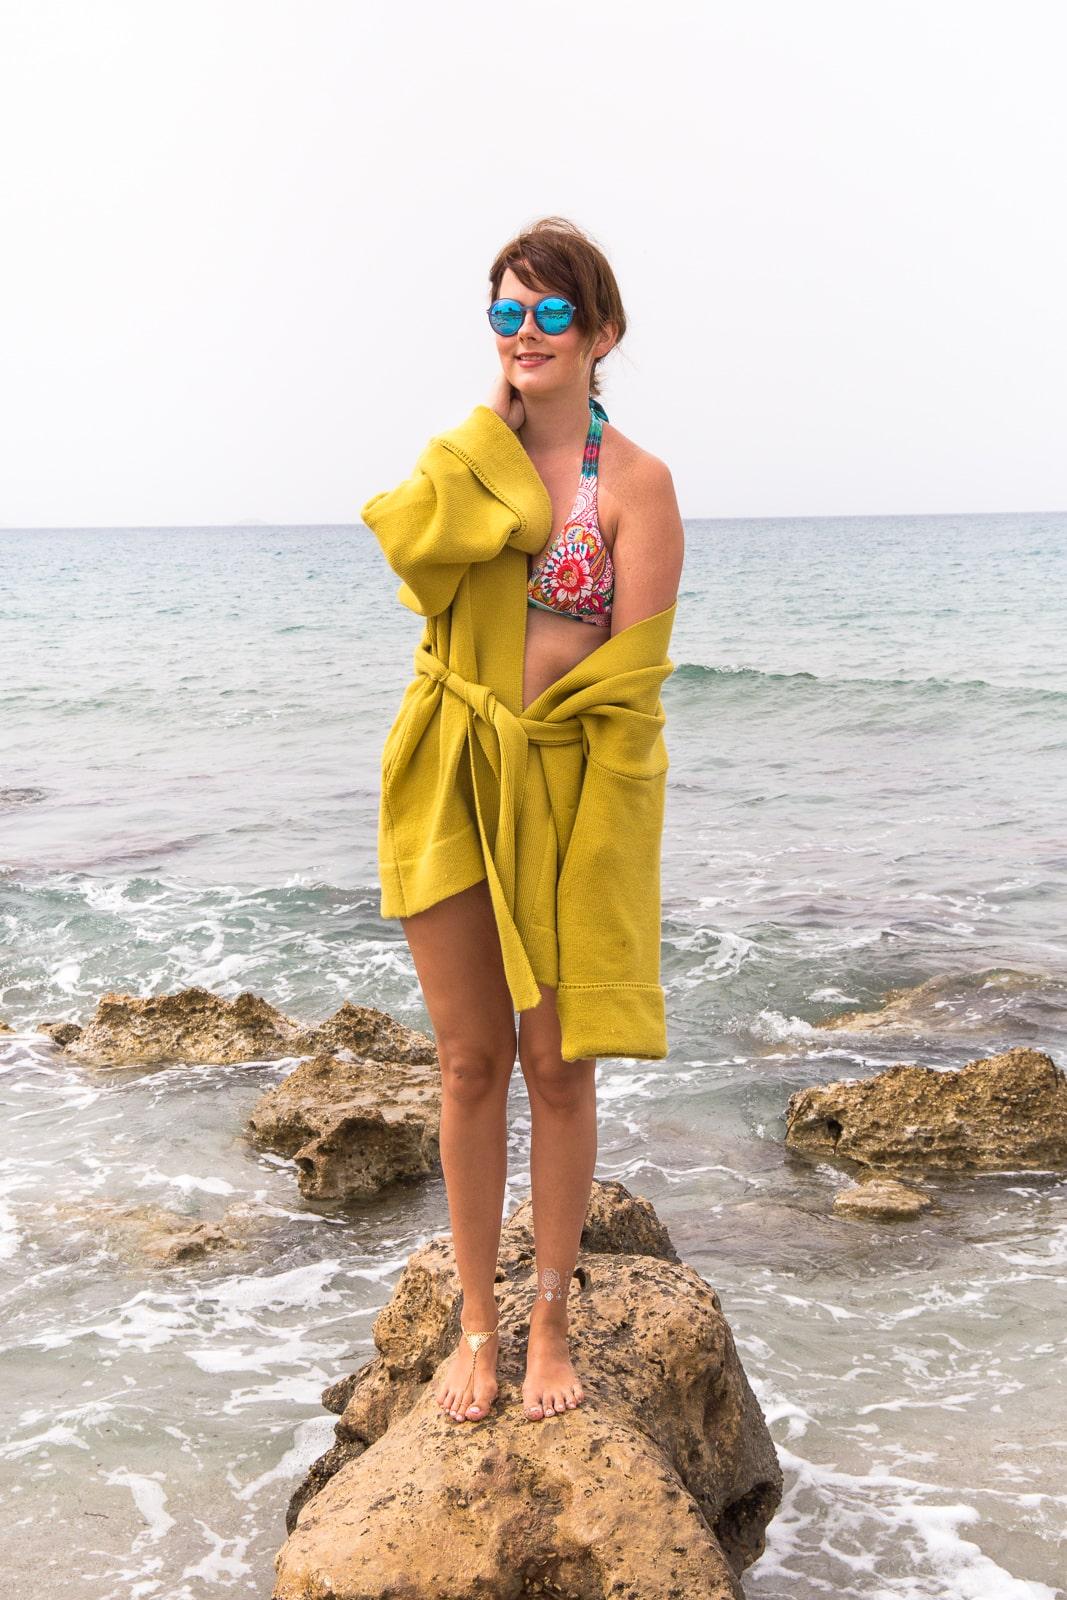 beach style auf kreta desigual bikini flash tattoos. Black Bedroom Furniture Sets. Home Design Ideas